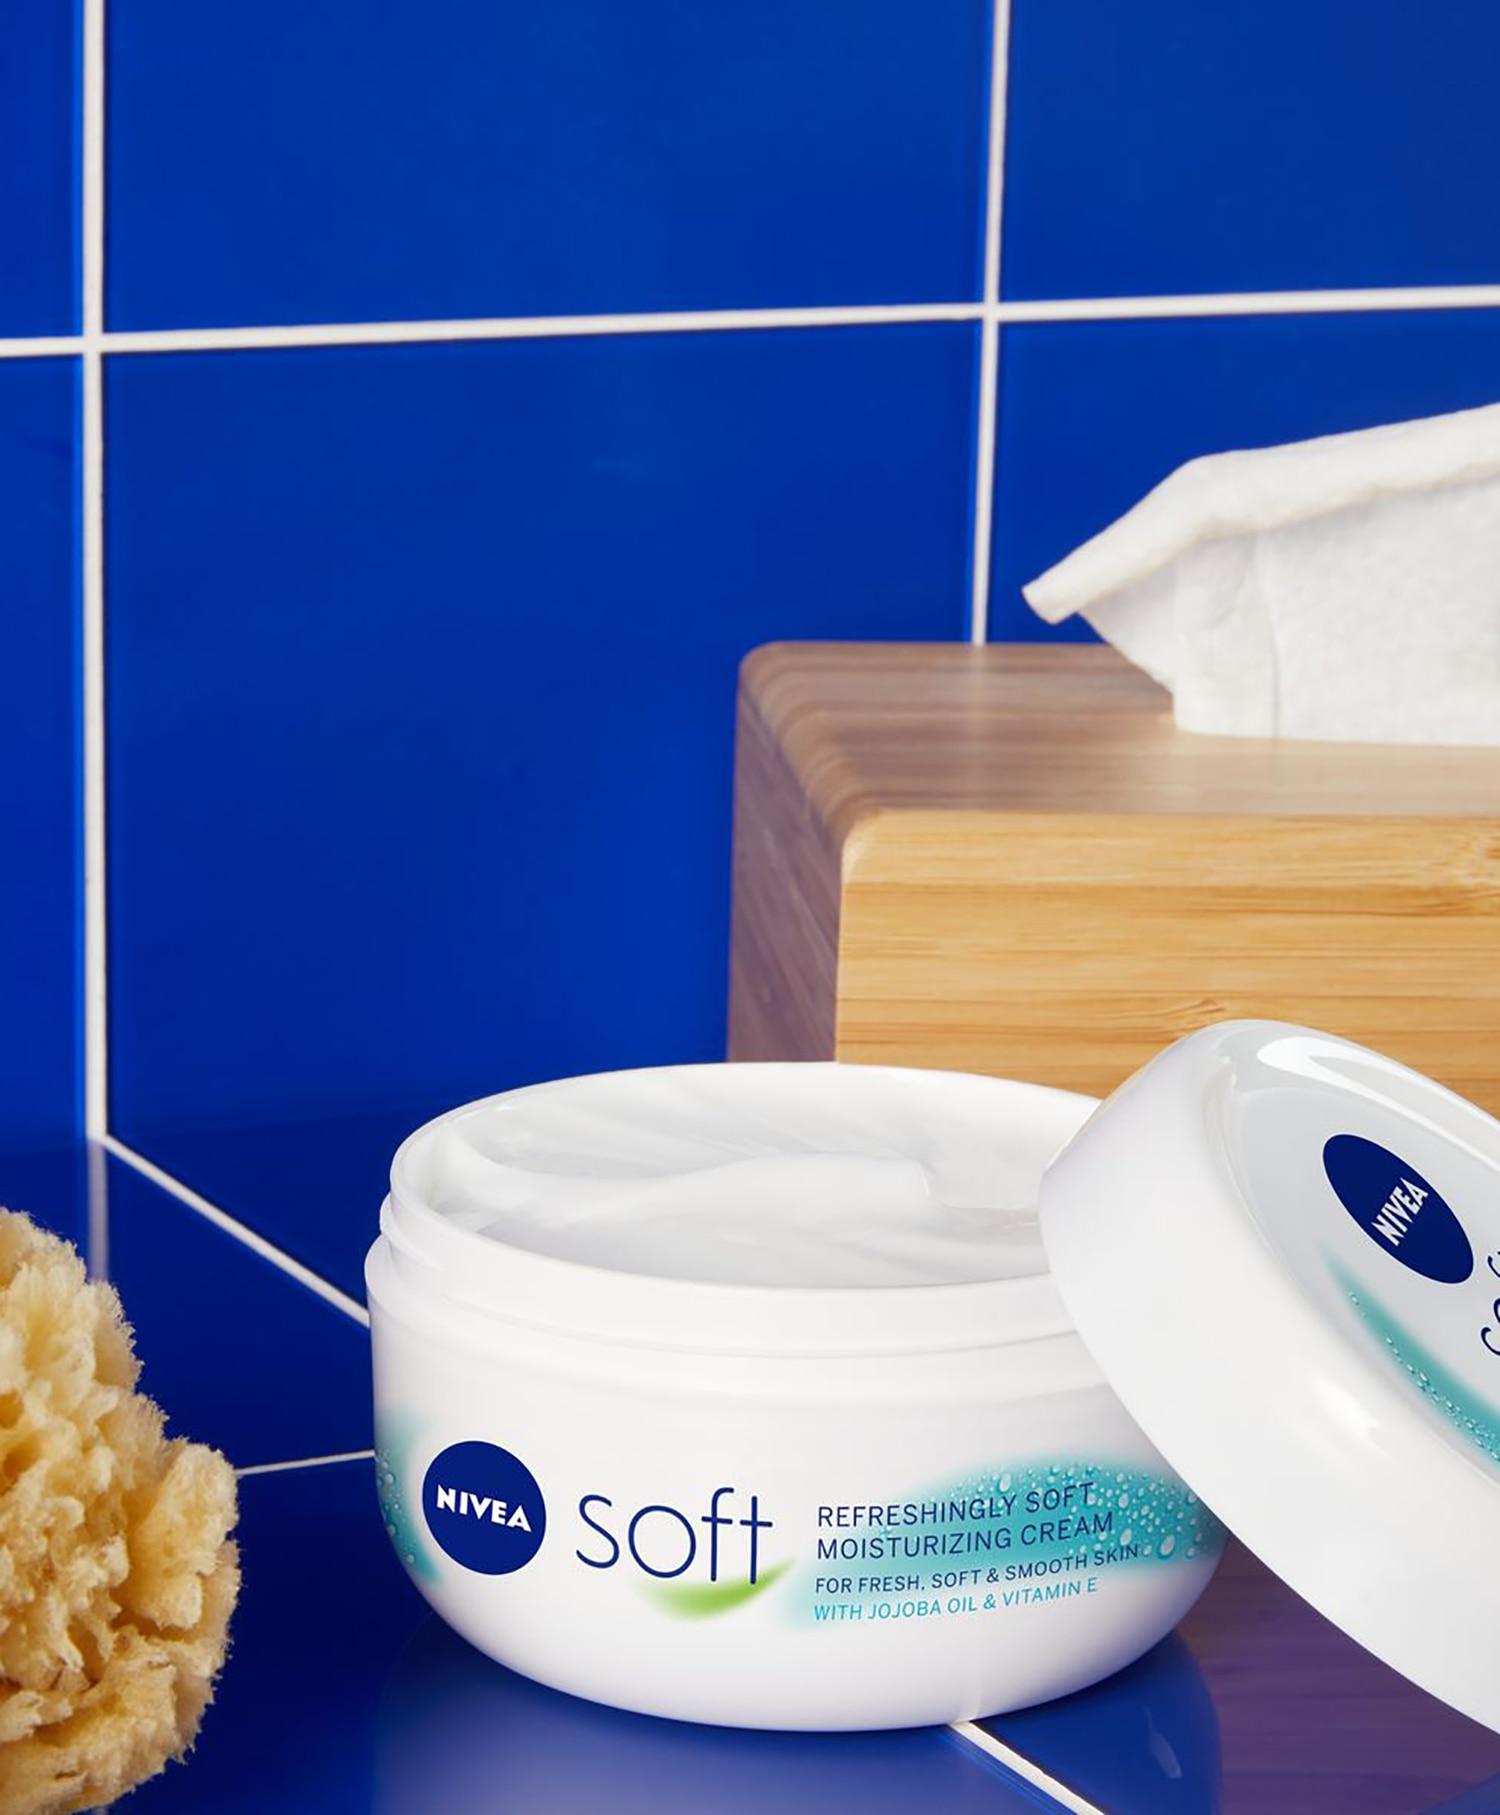 Nivea Soft Body and Face Cream